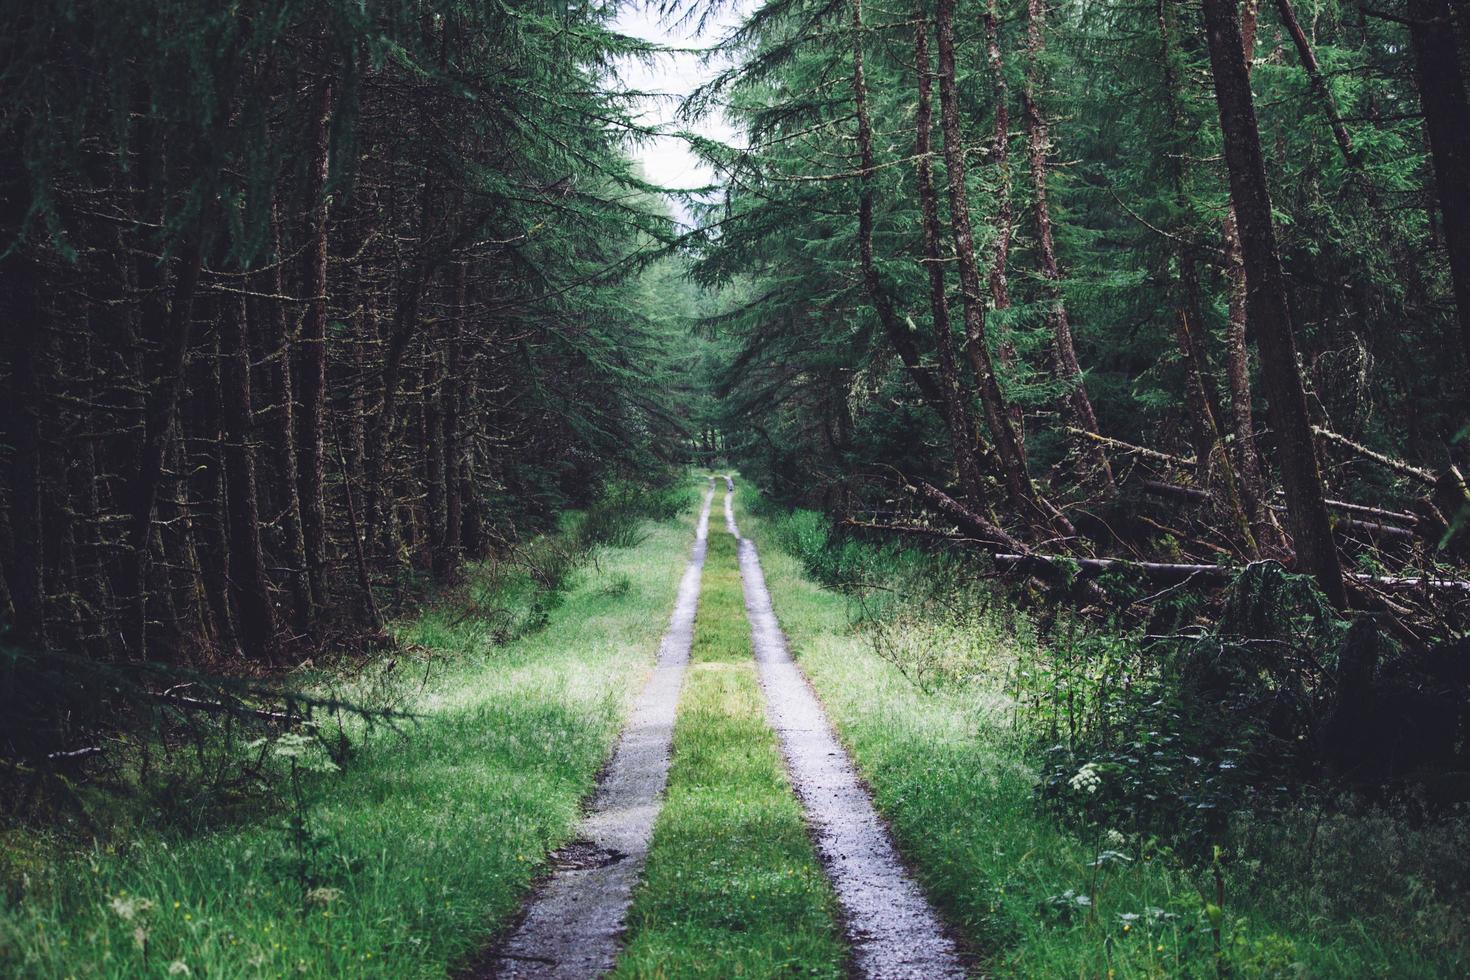 grasweg tussen bosbomen foto